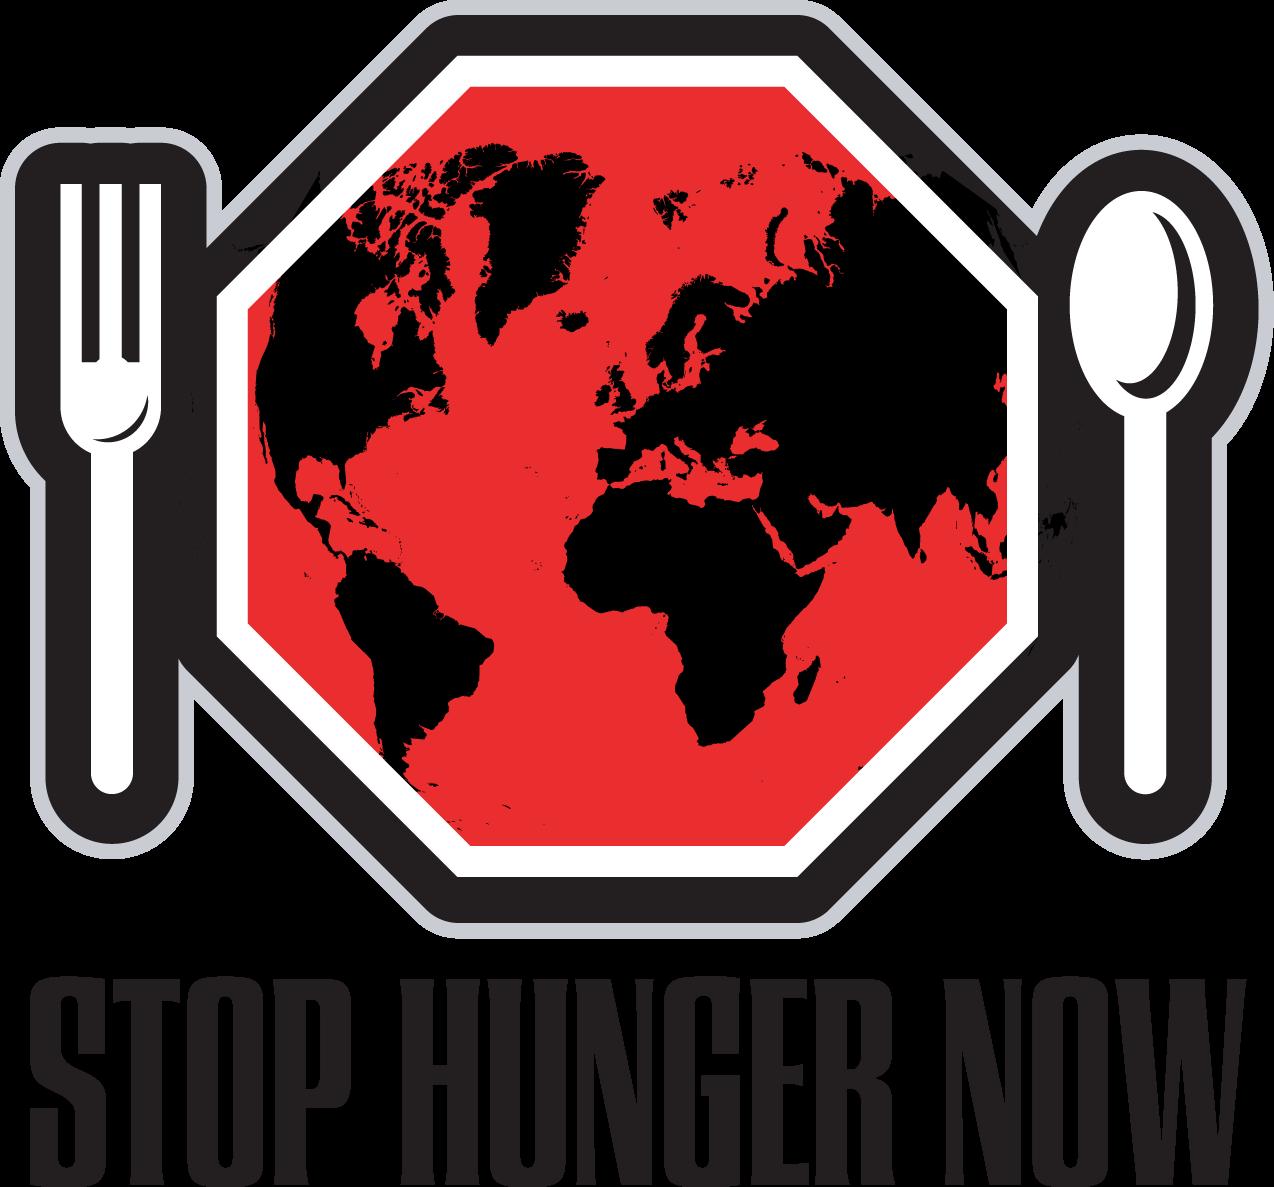 Organization how ending poverty. Clipart world world hunger